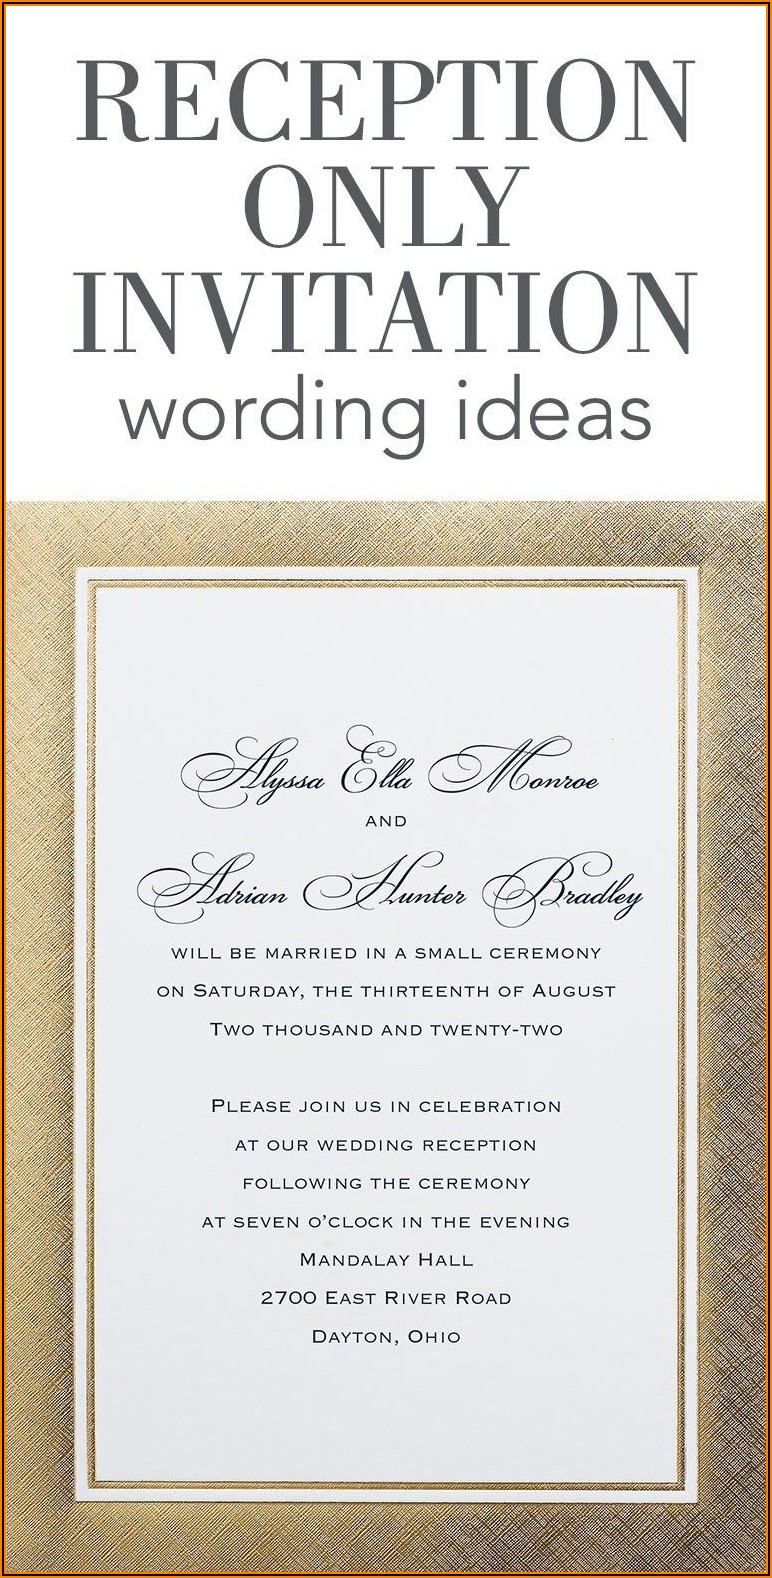 Casual Wedding Reception Invitation Wording Samples